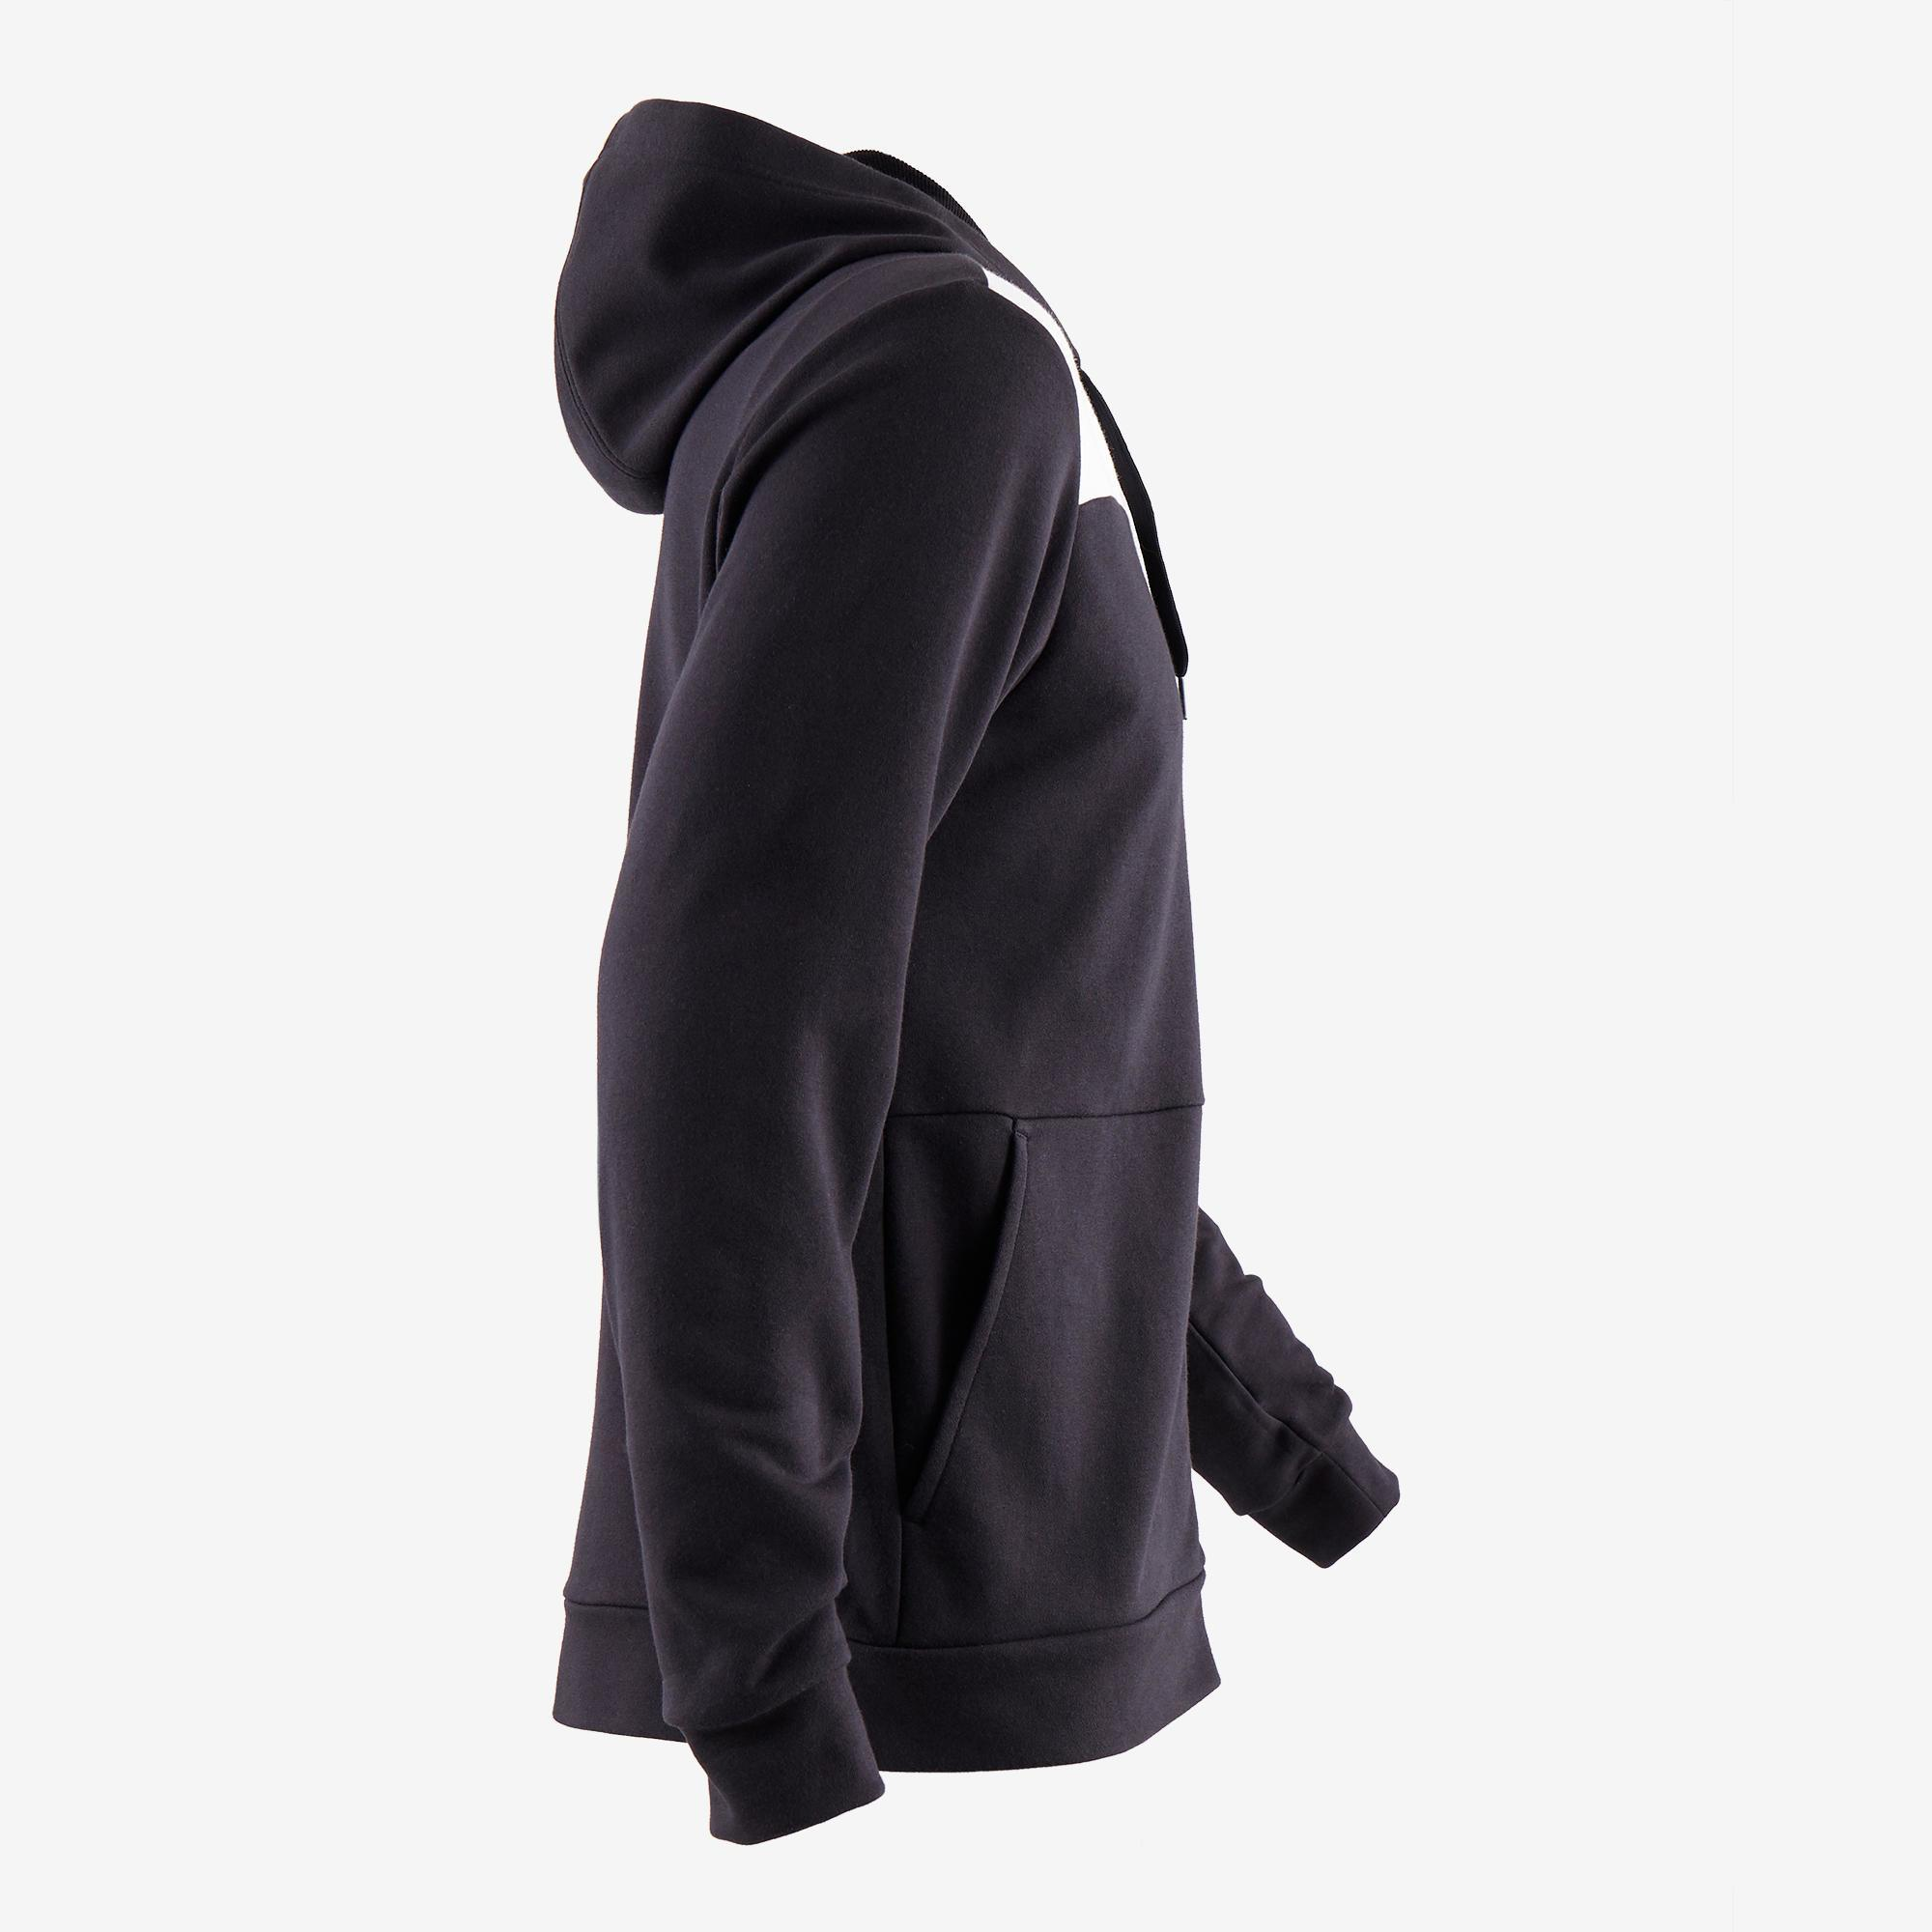 500 Capuche Noir Homme Adidas Stretching Veste Decathlon Gym UqZxX5E 7a3be1fc5a3